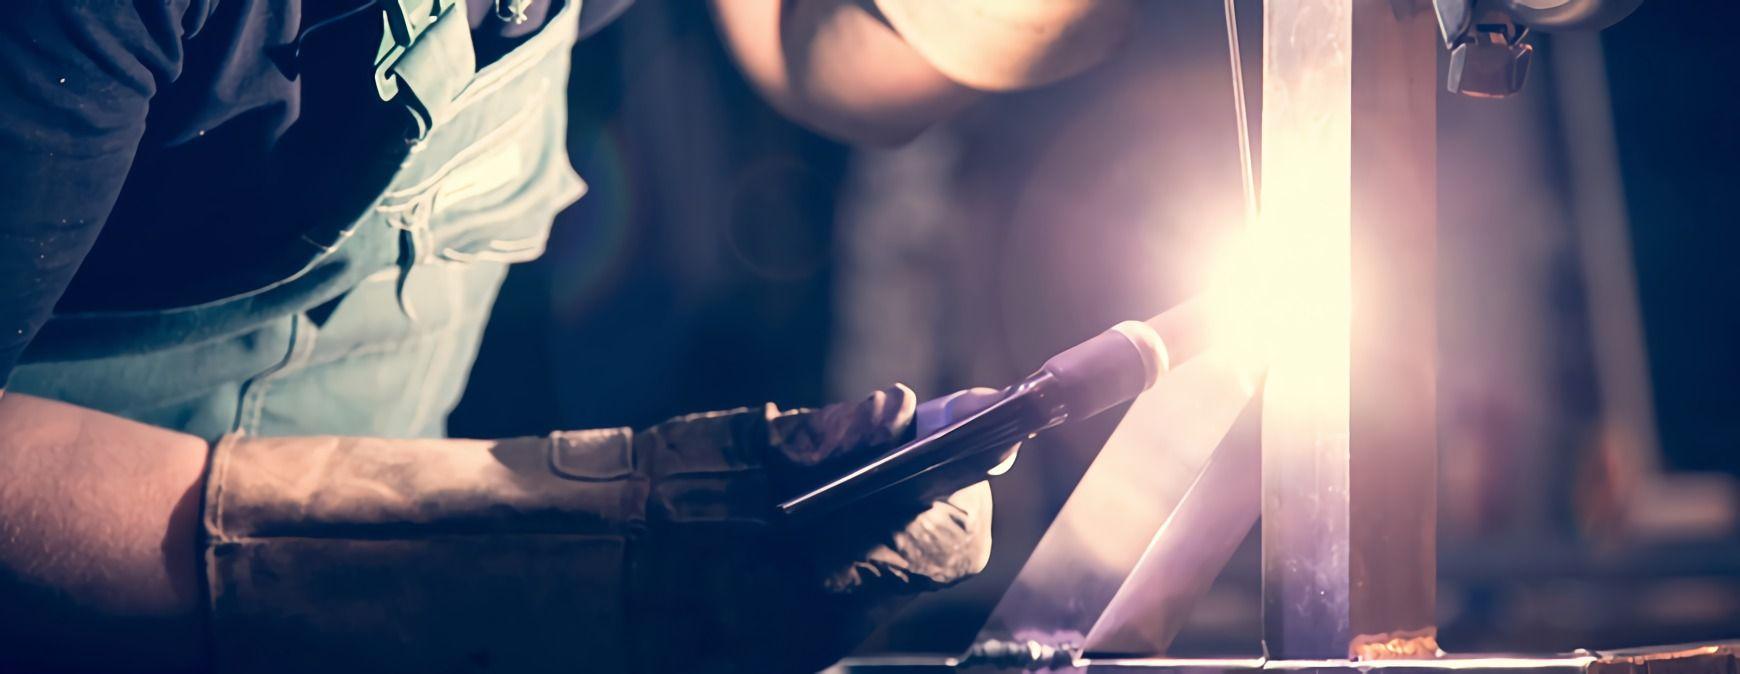 welding diy projects